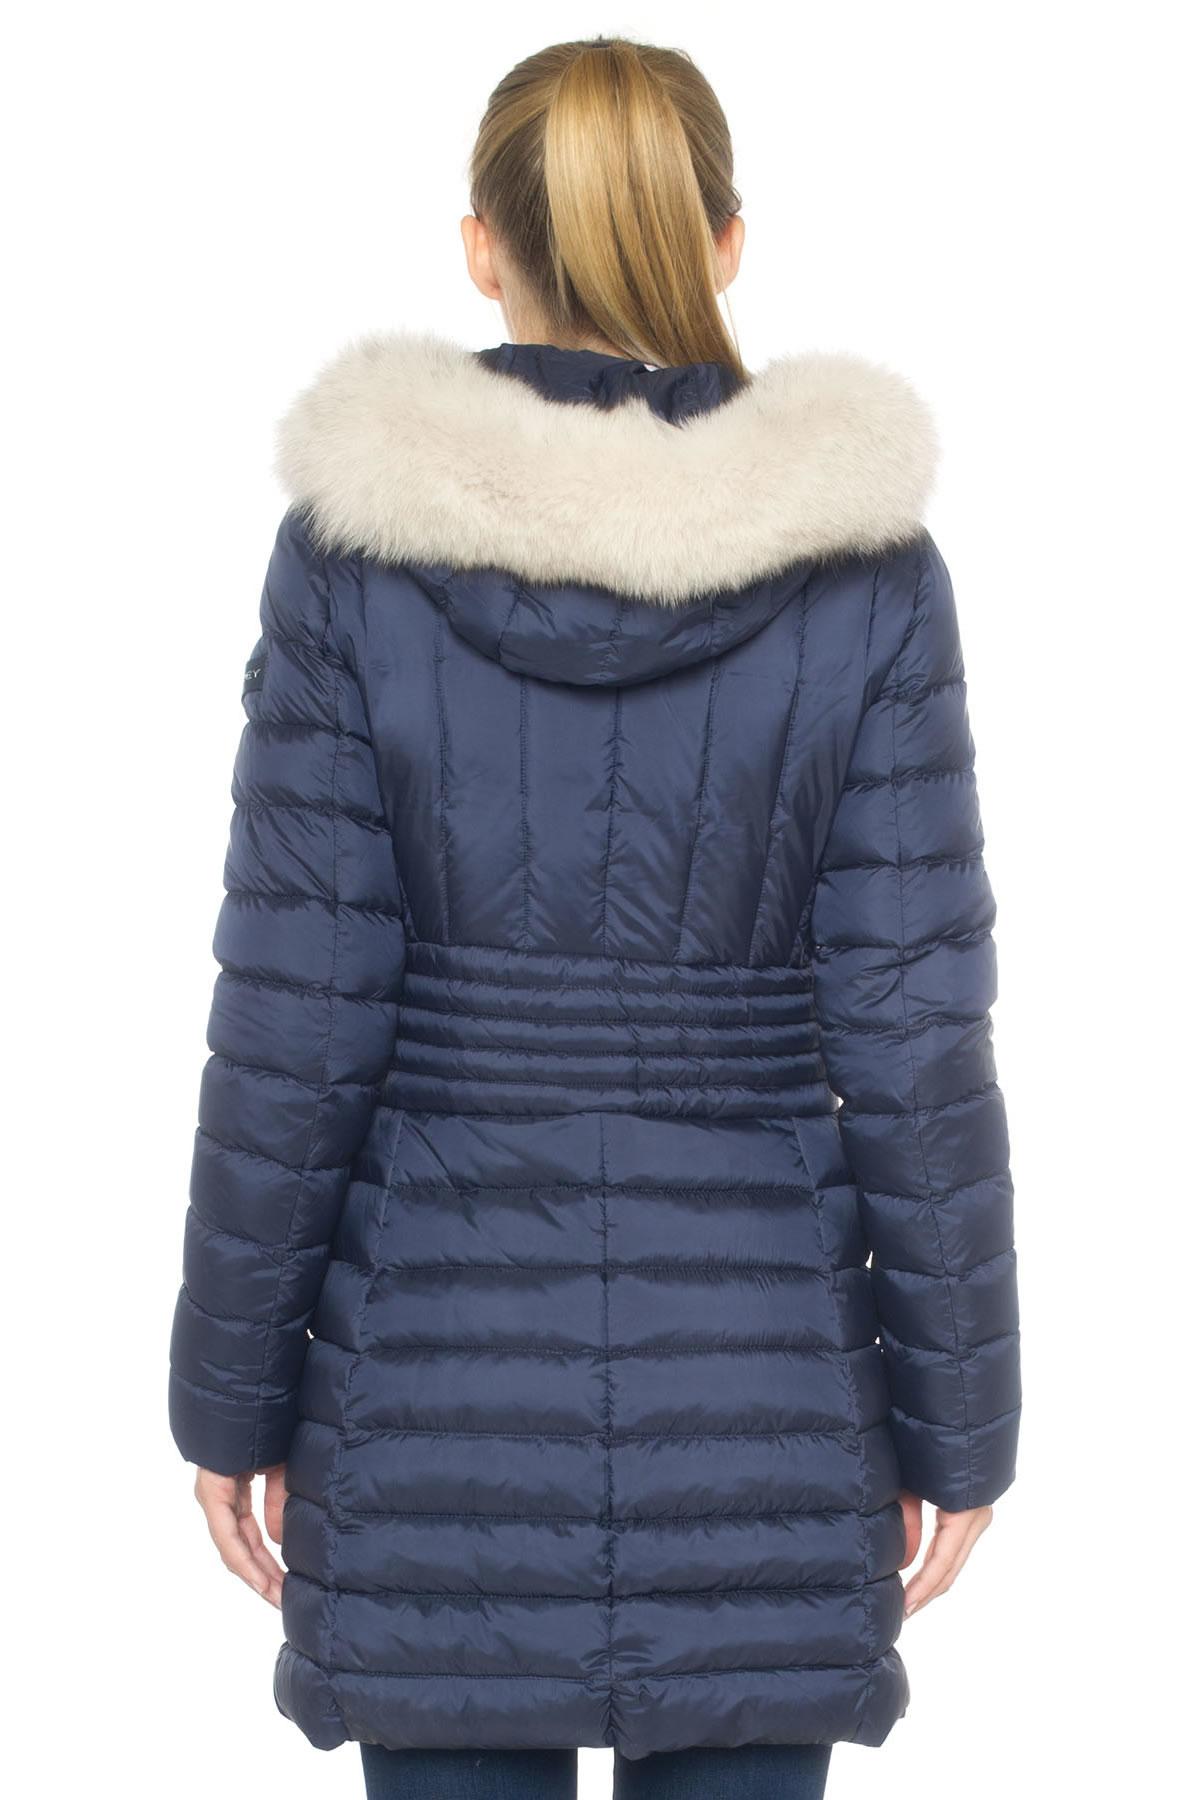 Peuterey Down Jacket Women